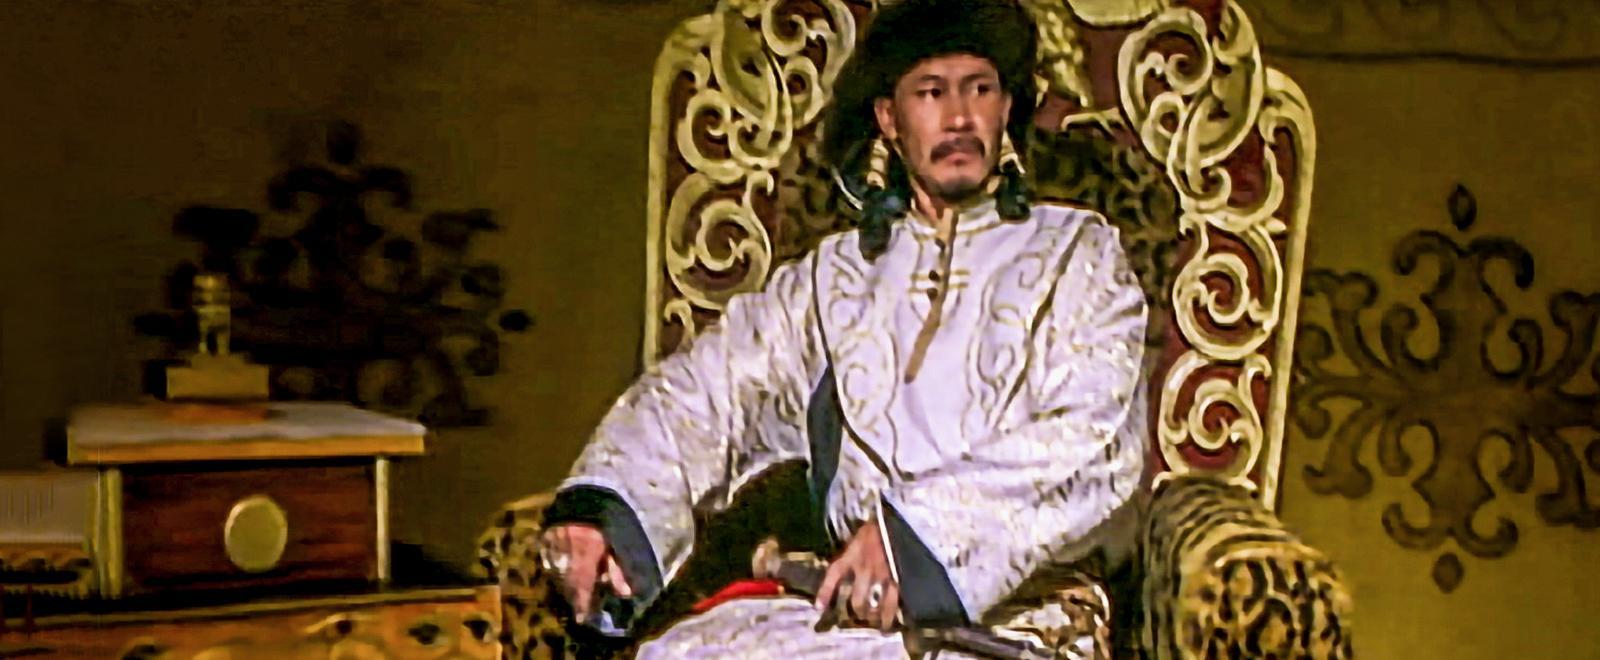 Grandi della storia: Gengis Khan - Il..